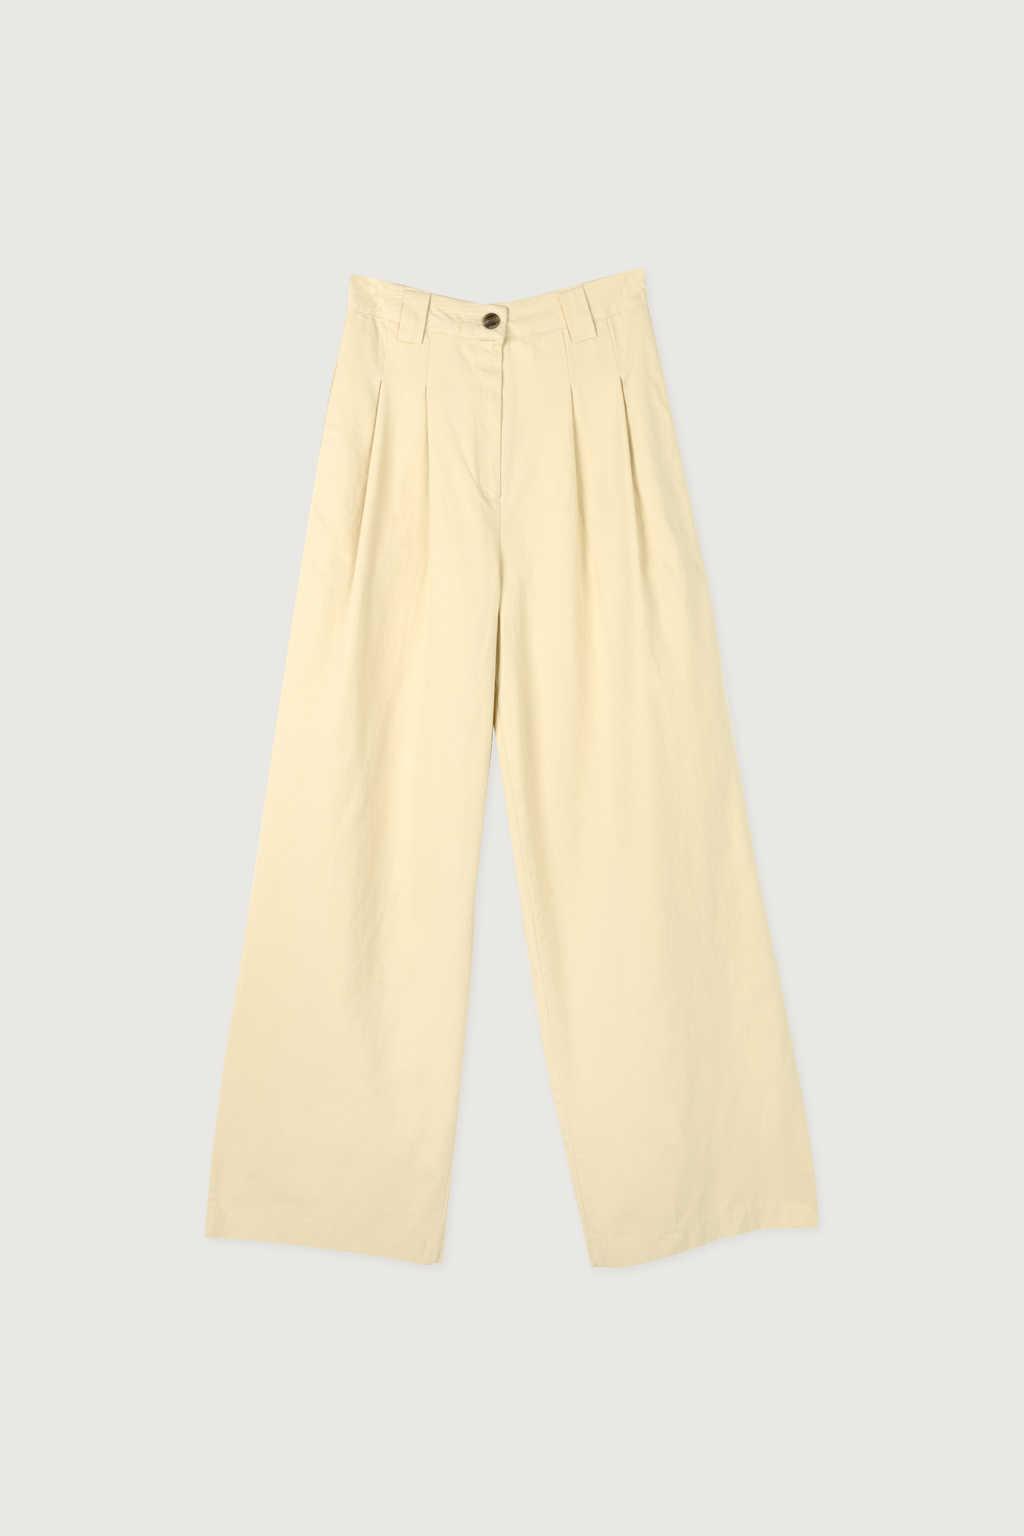 Pant K013 Yellow 5